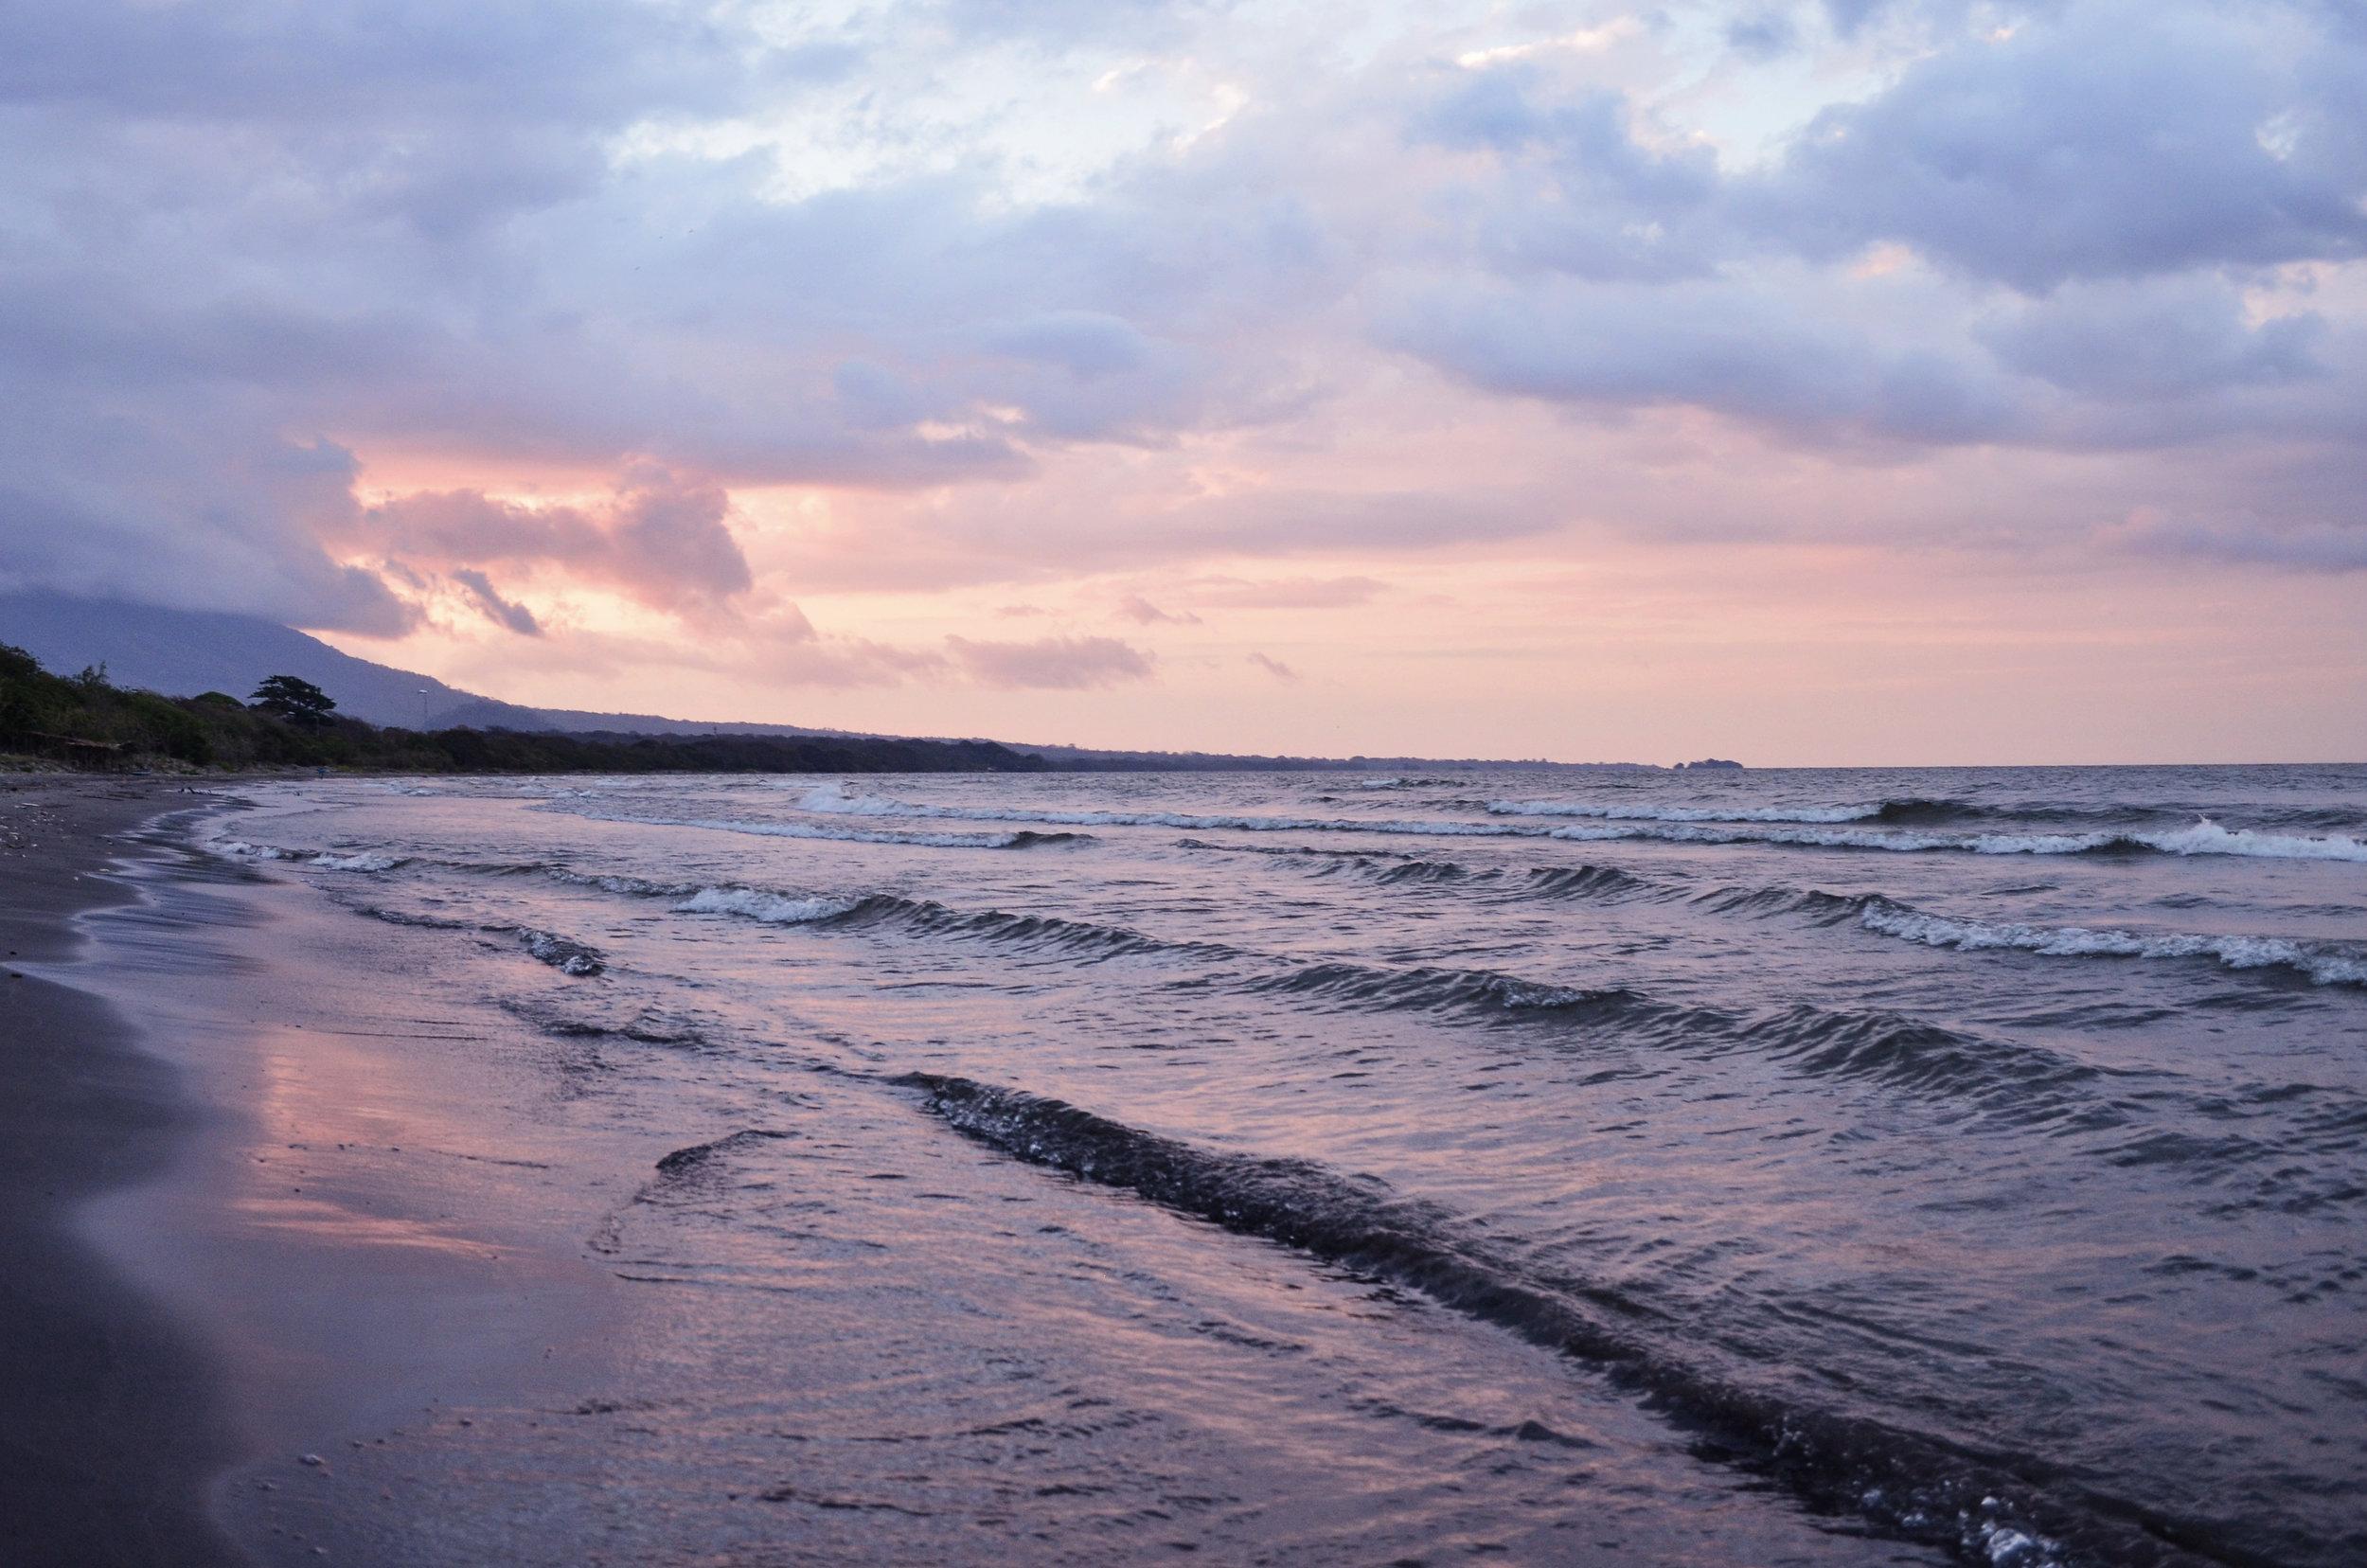 Playa Santo Domingo at sunset.